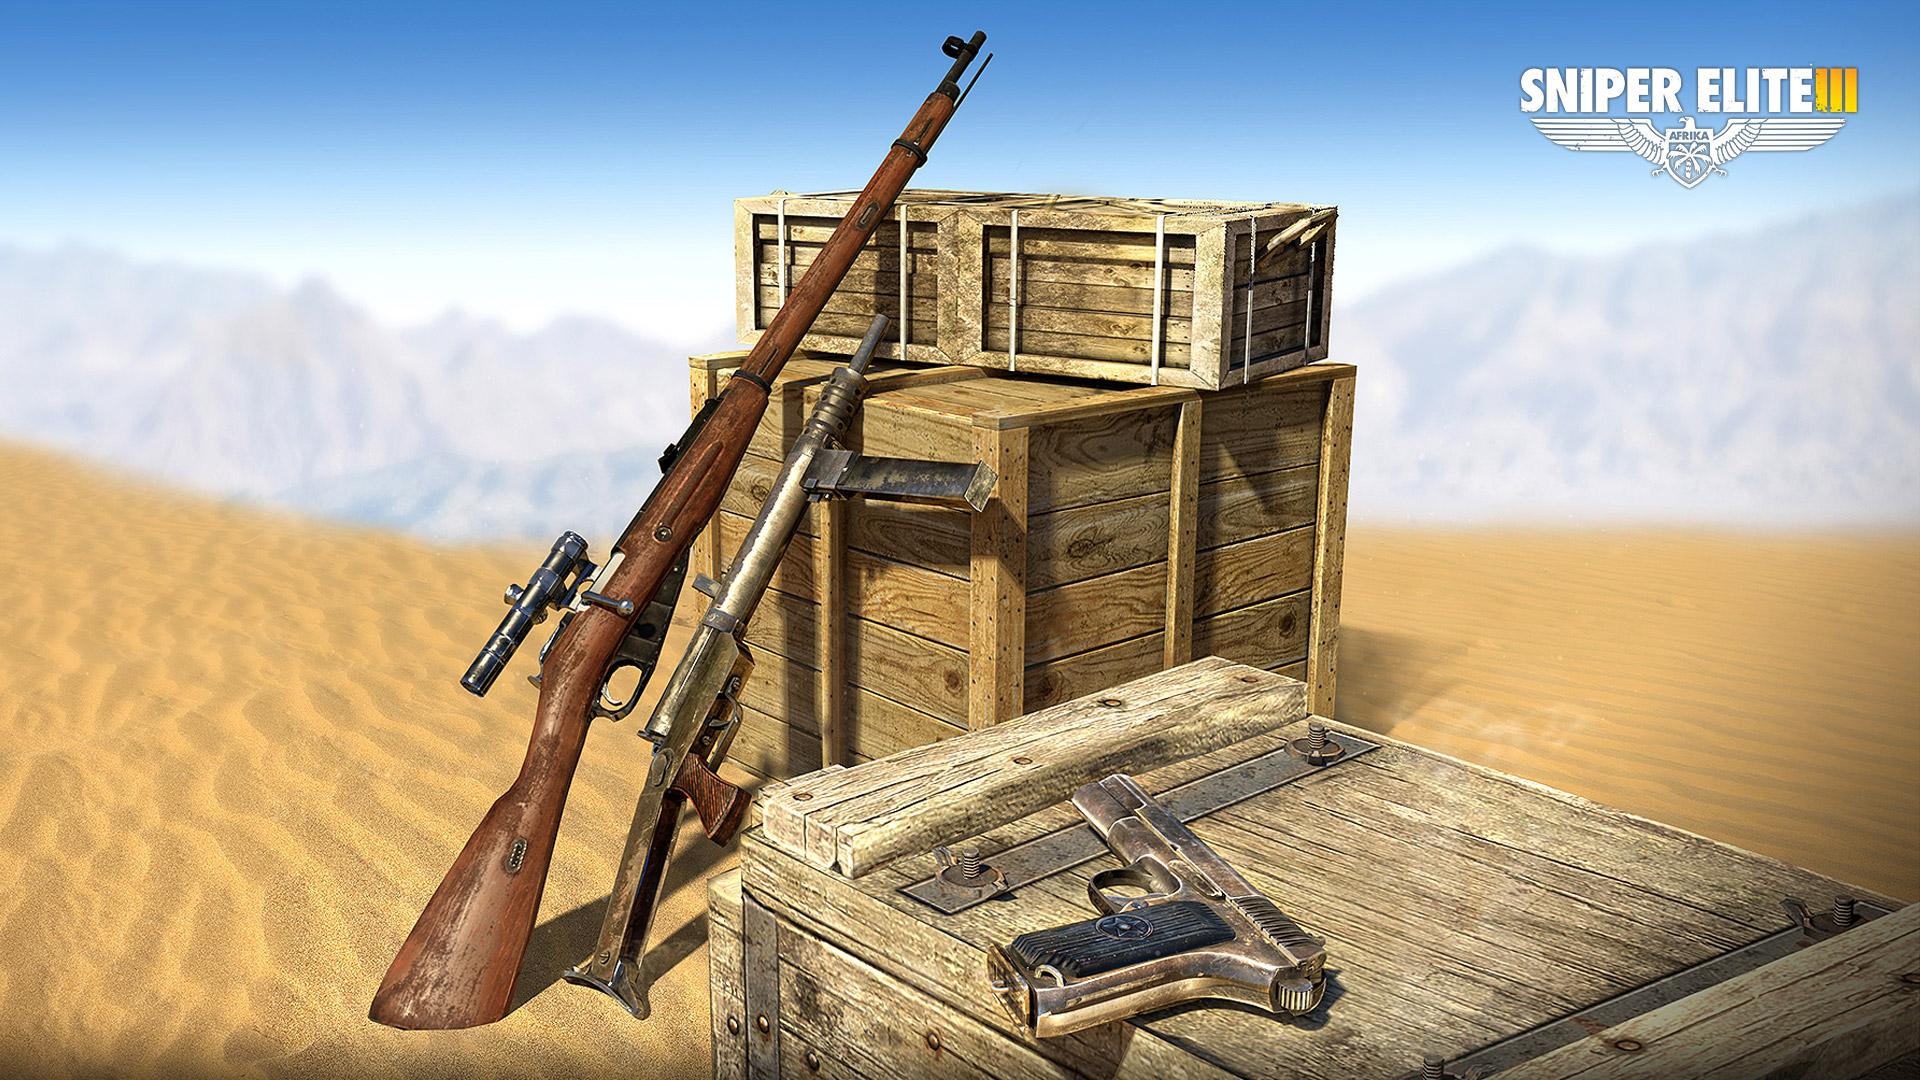 Free Sniper Elite 3 Wallpaper in 1920x1080